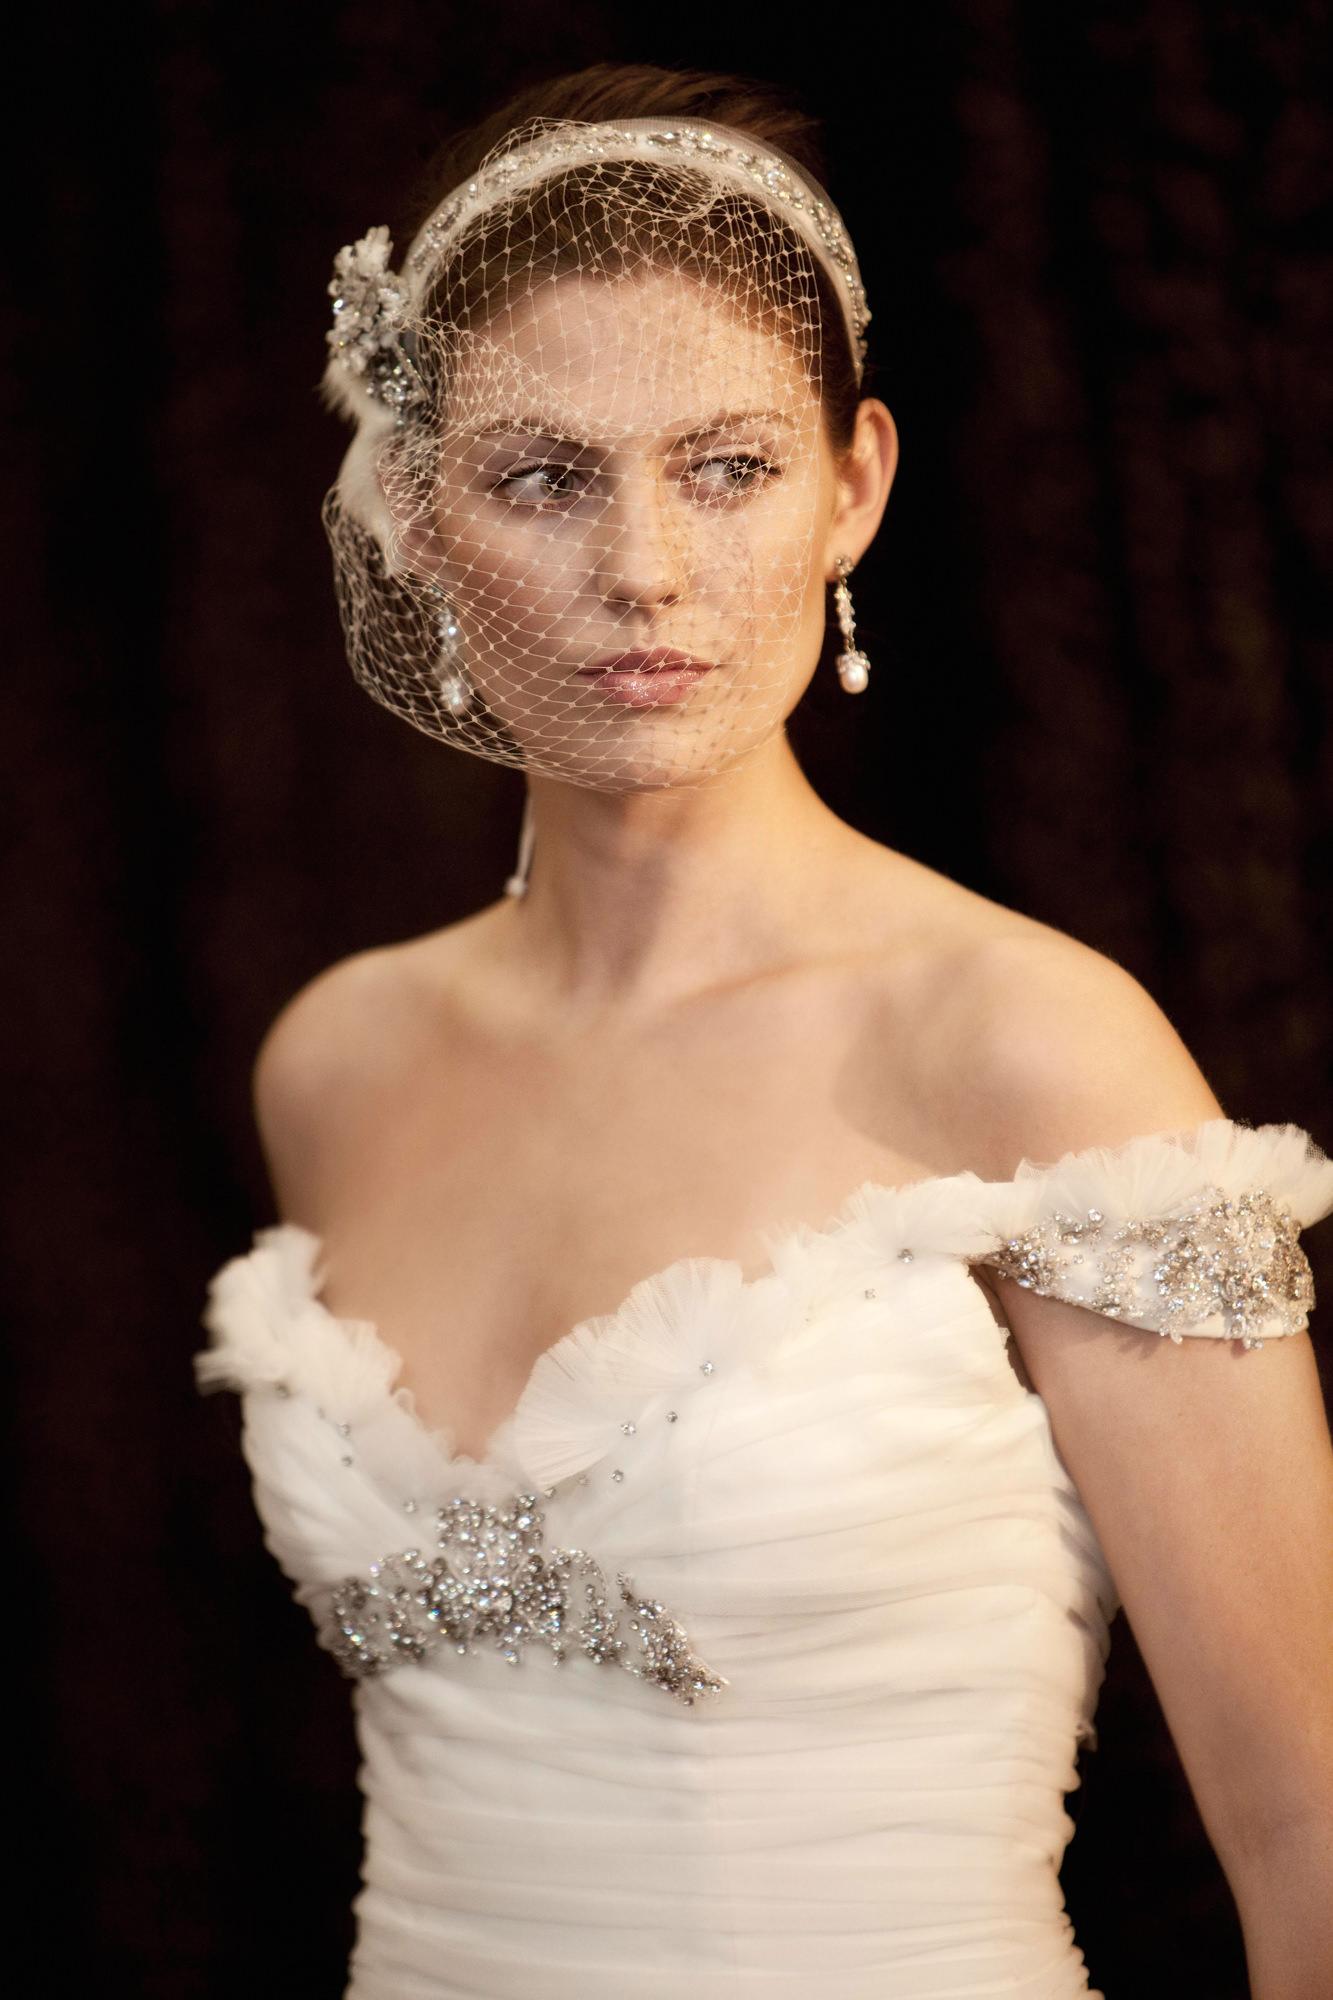 Bride in birdcage veil and feather bodice - Roberto Valenzuela Weddings